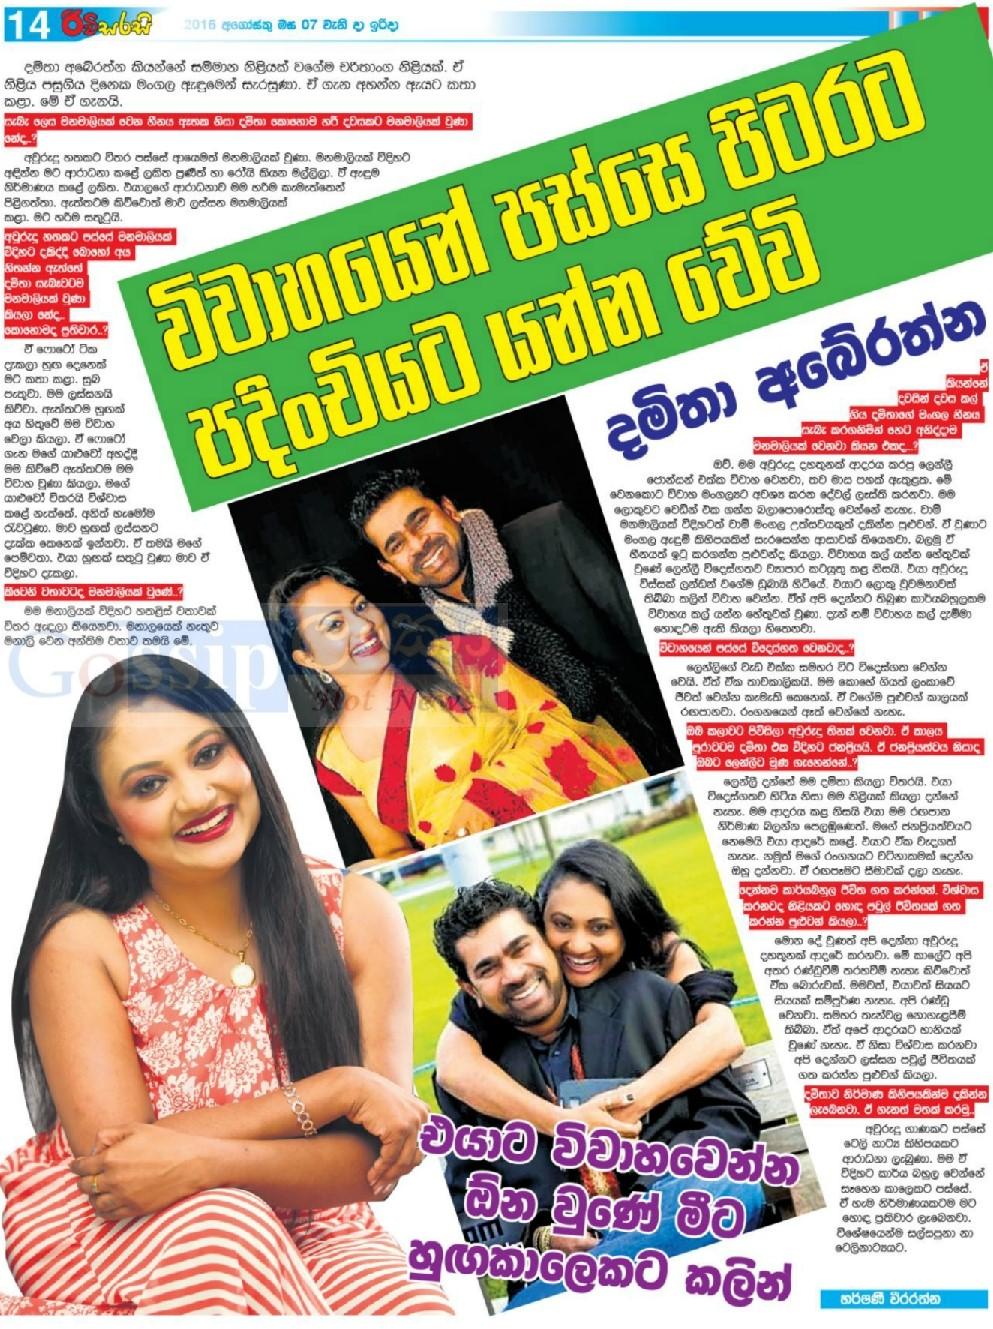 Gossip Lanka Chat With Damitha Abeyratne